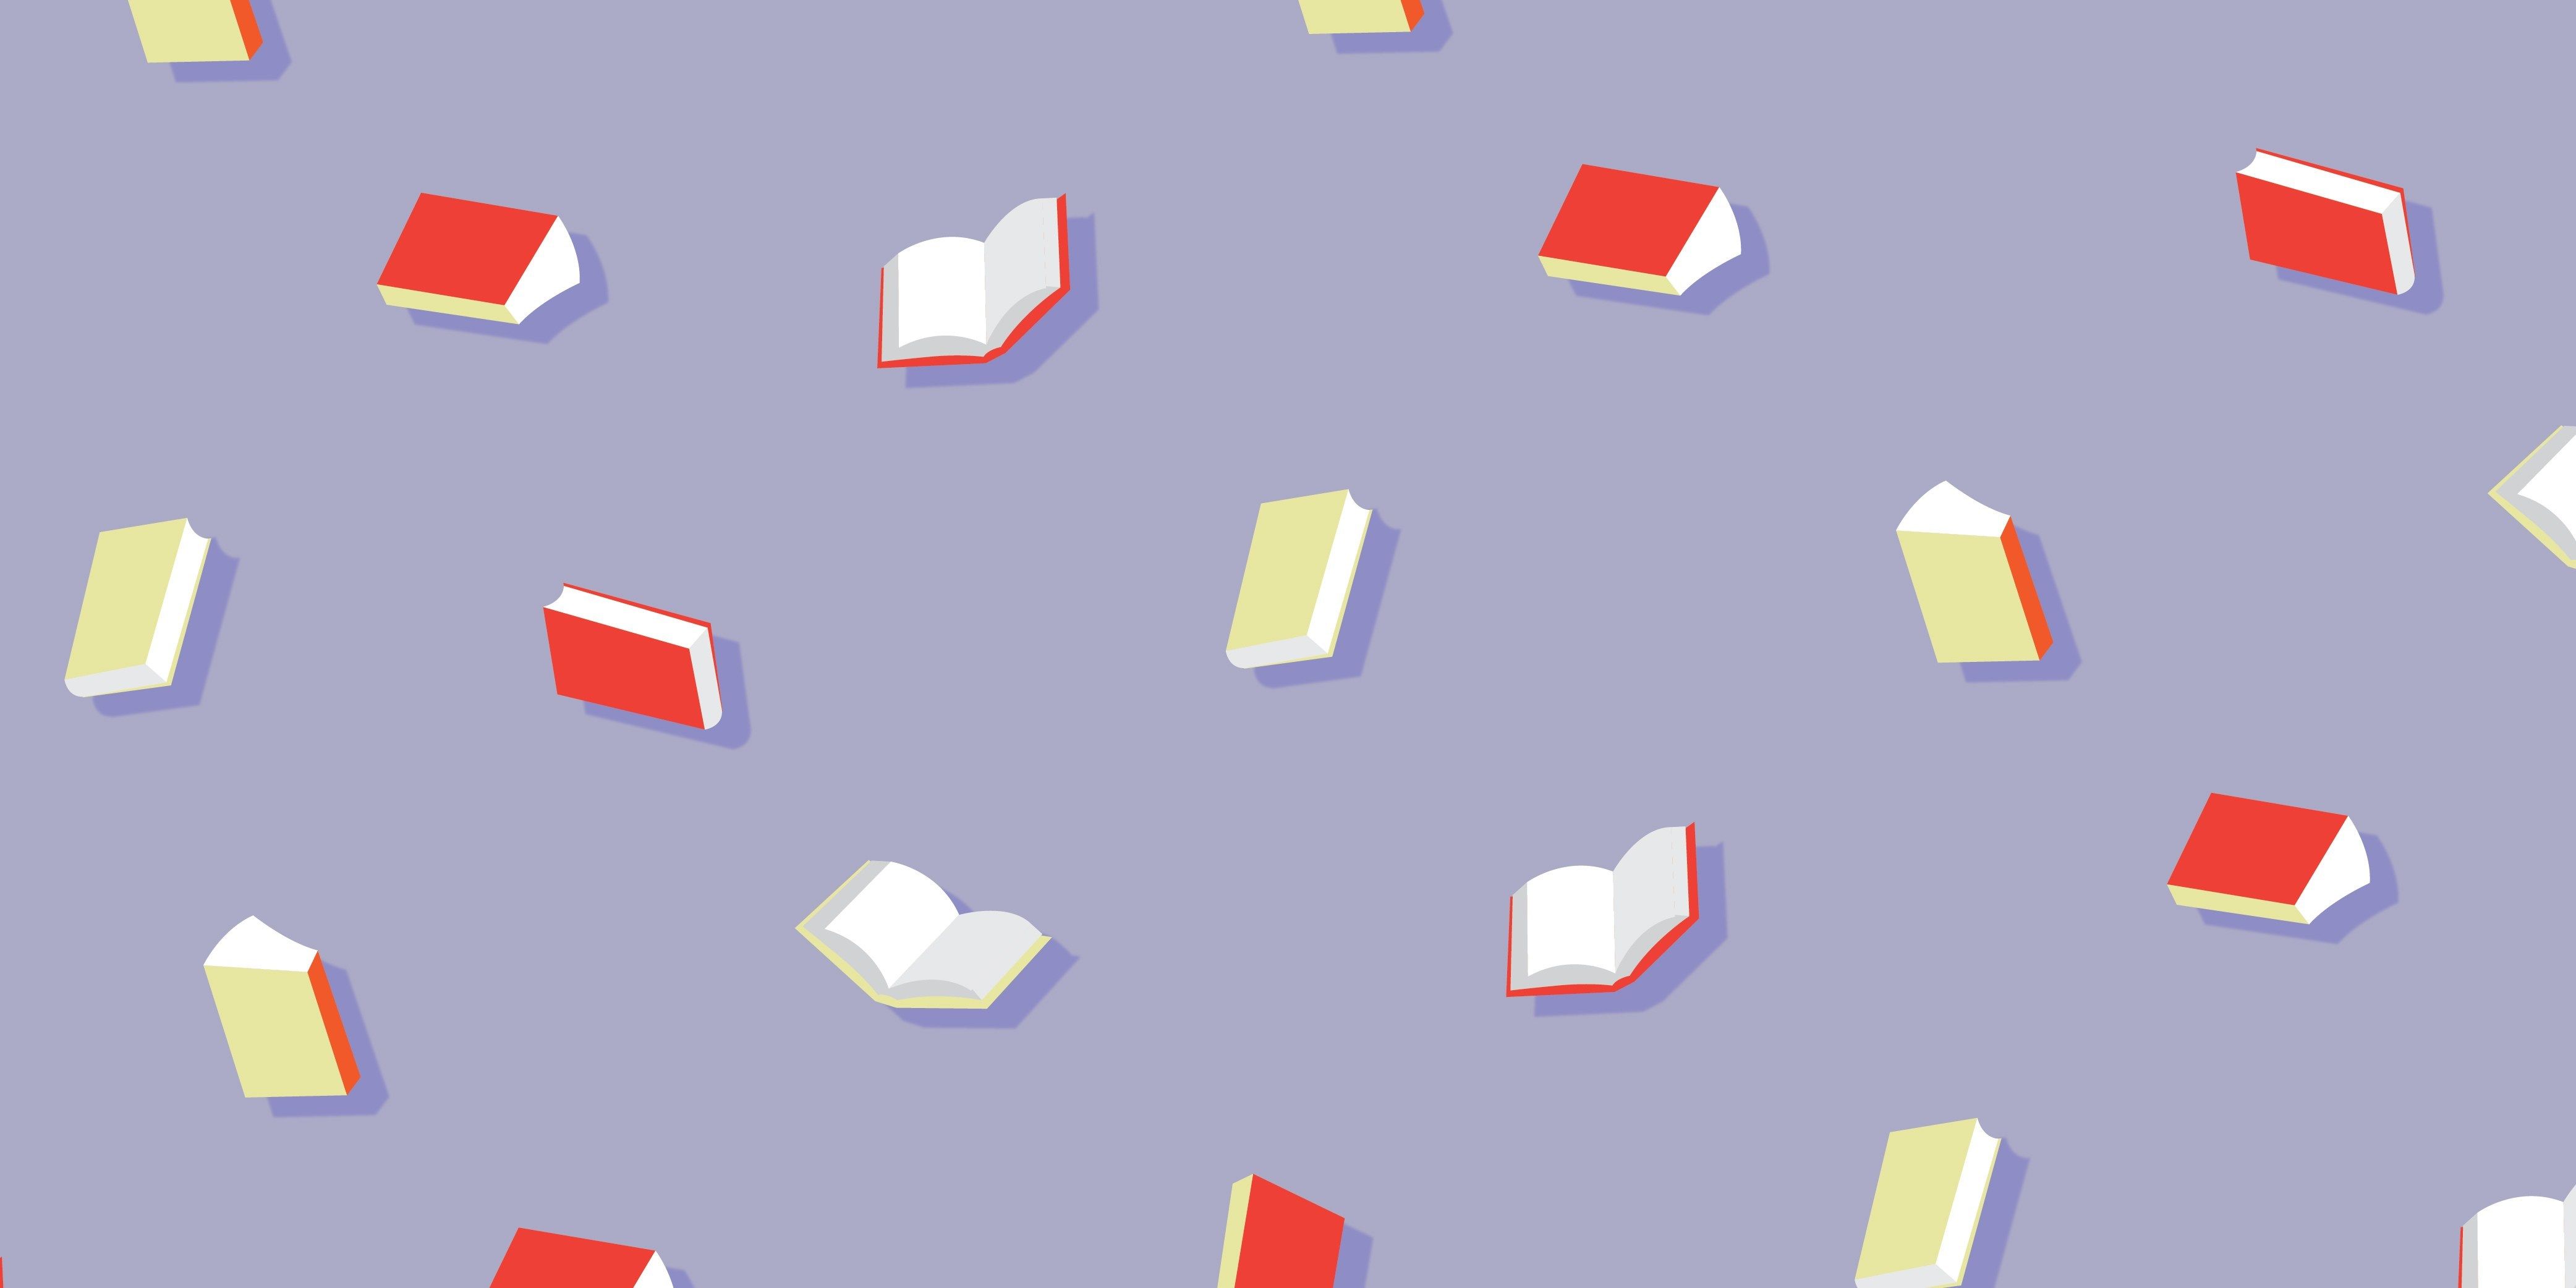 books_illustration-01